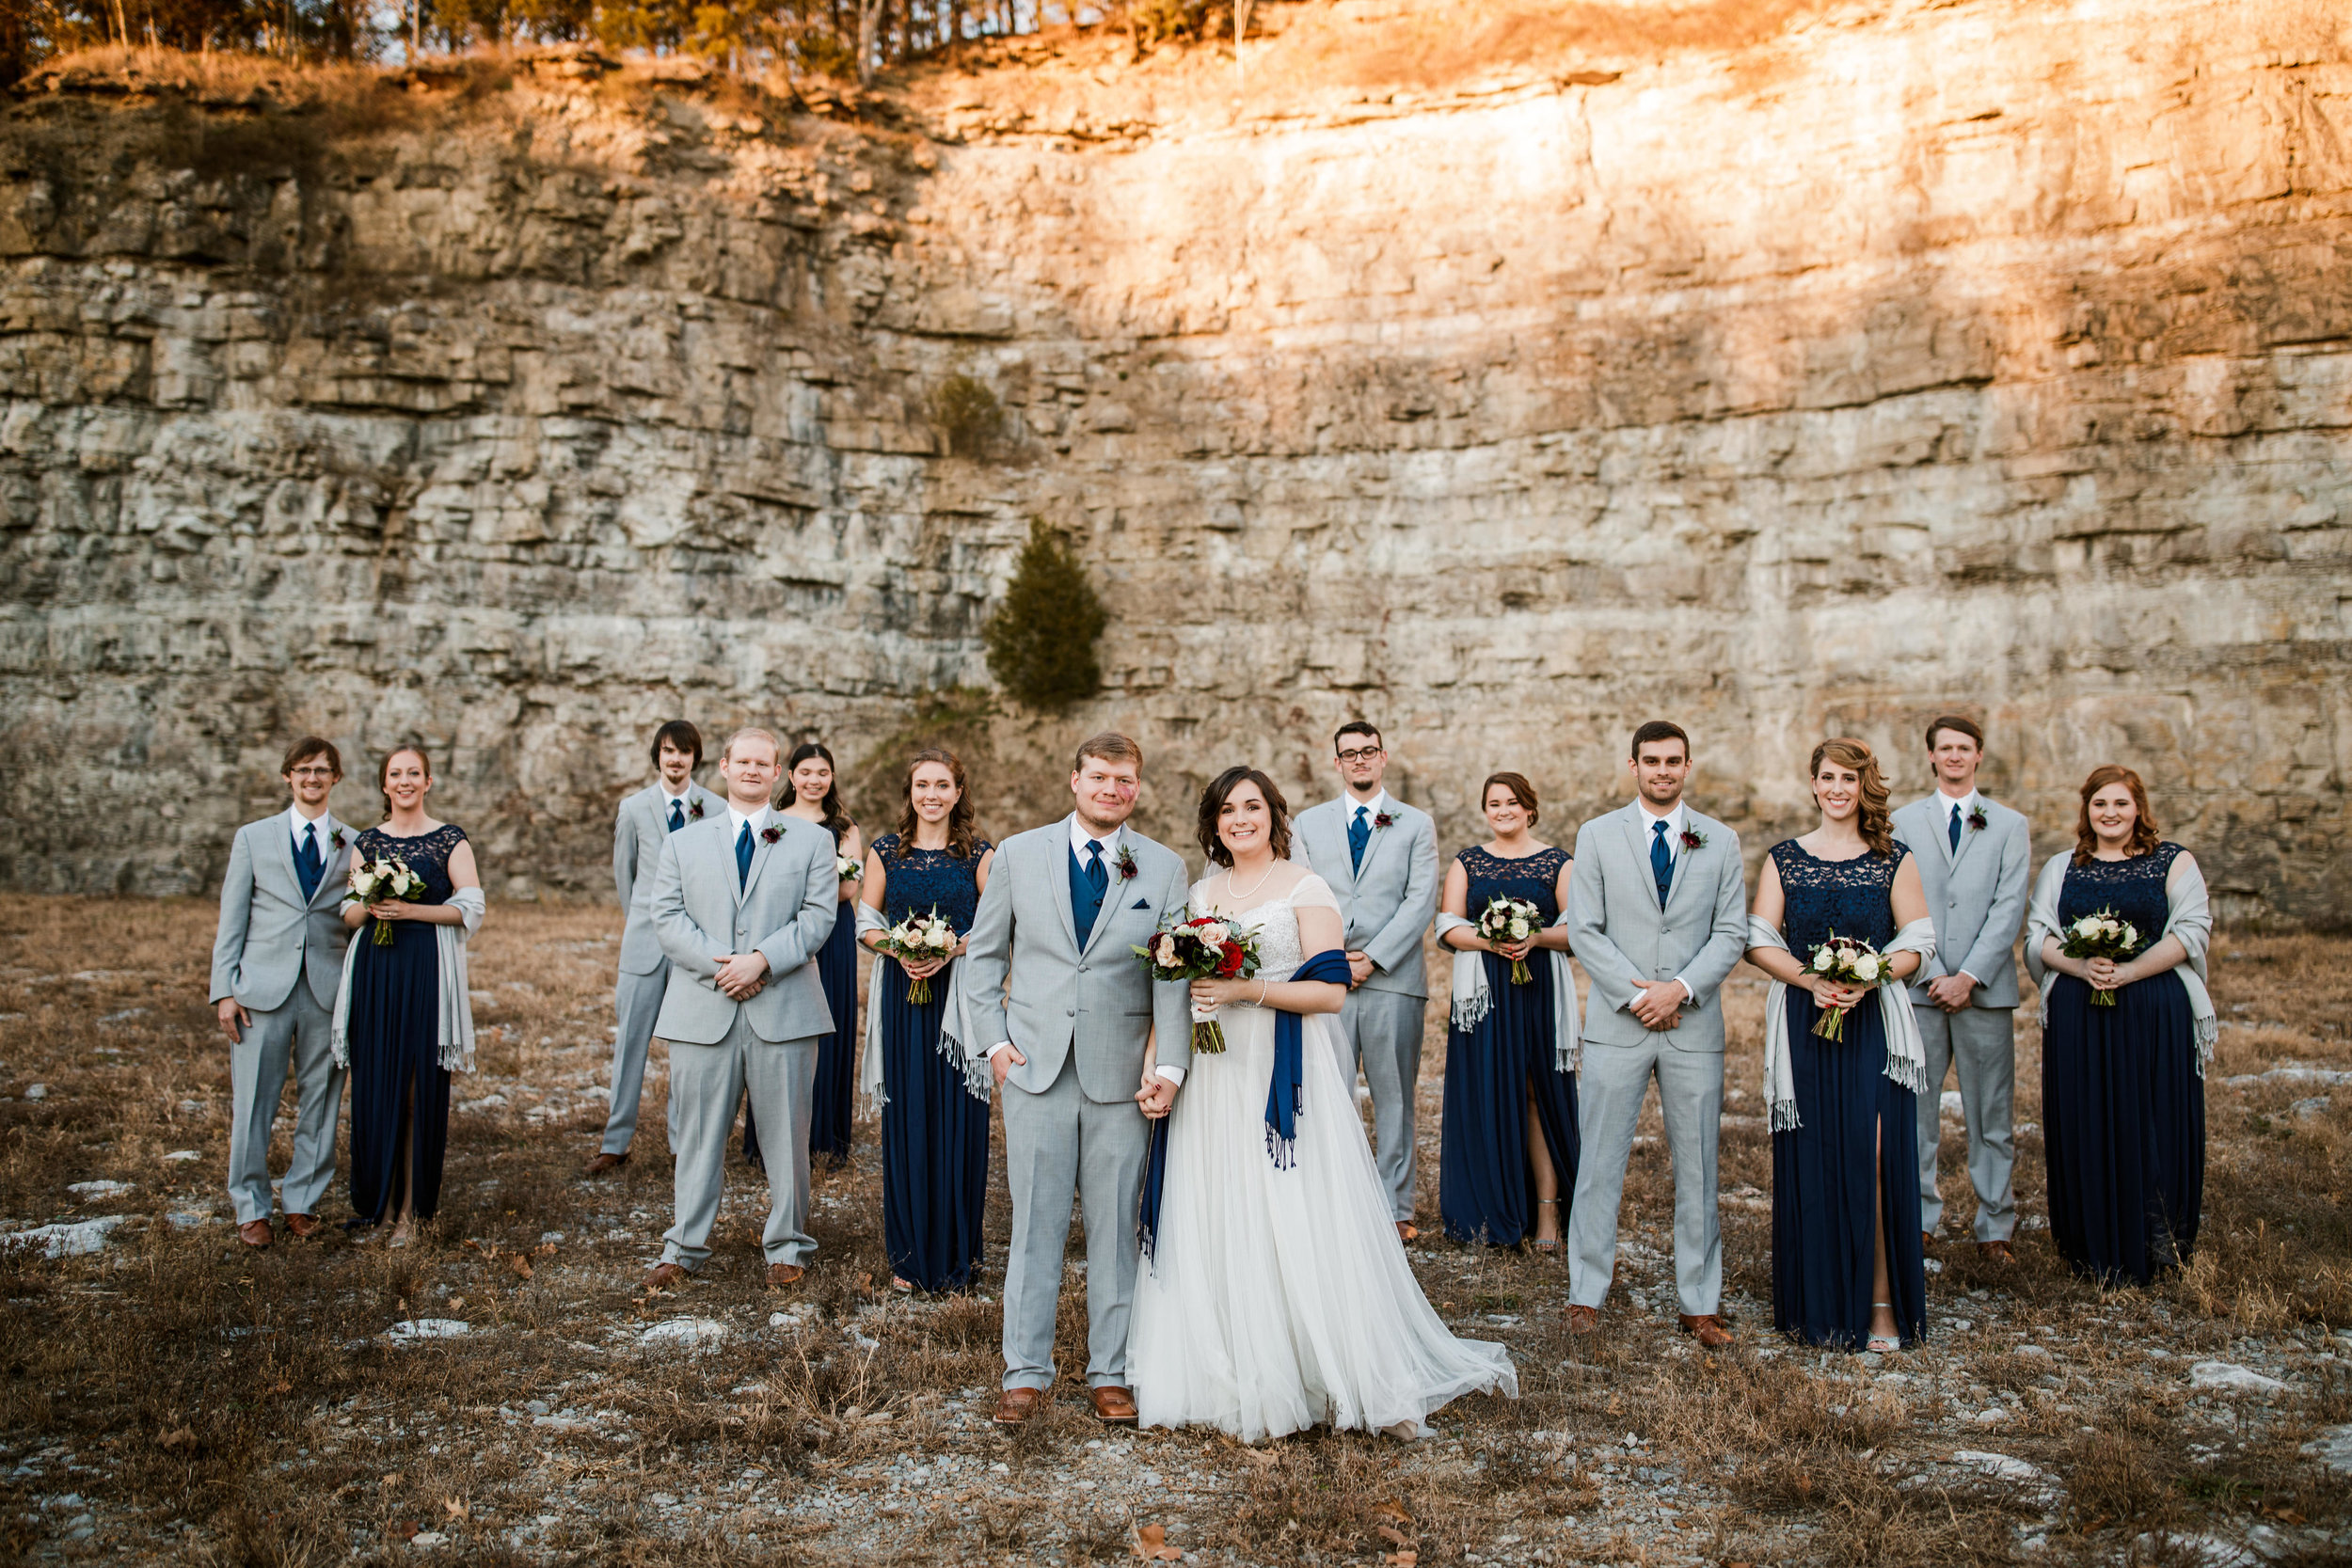 Graystone-Quarry-Wedding 55.jpg